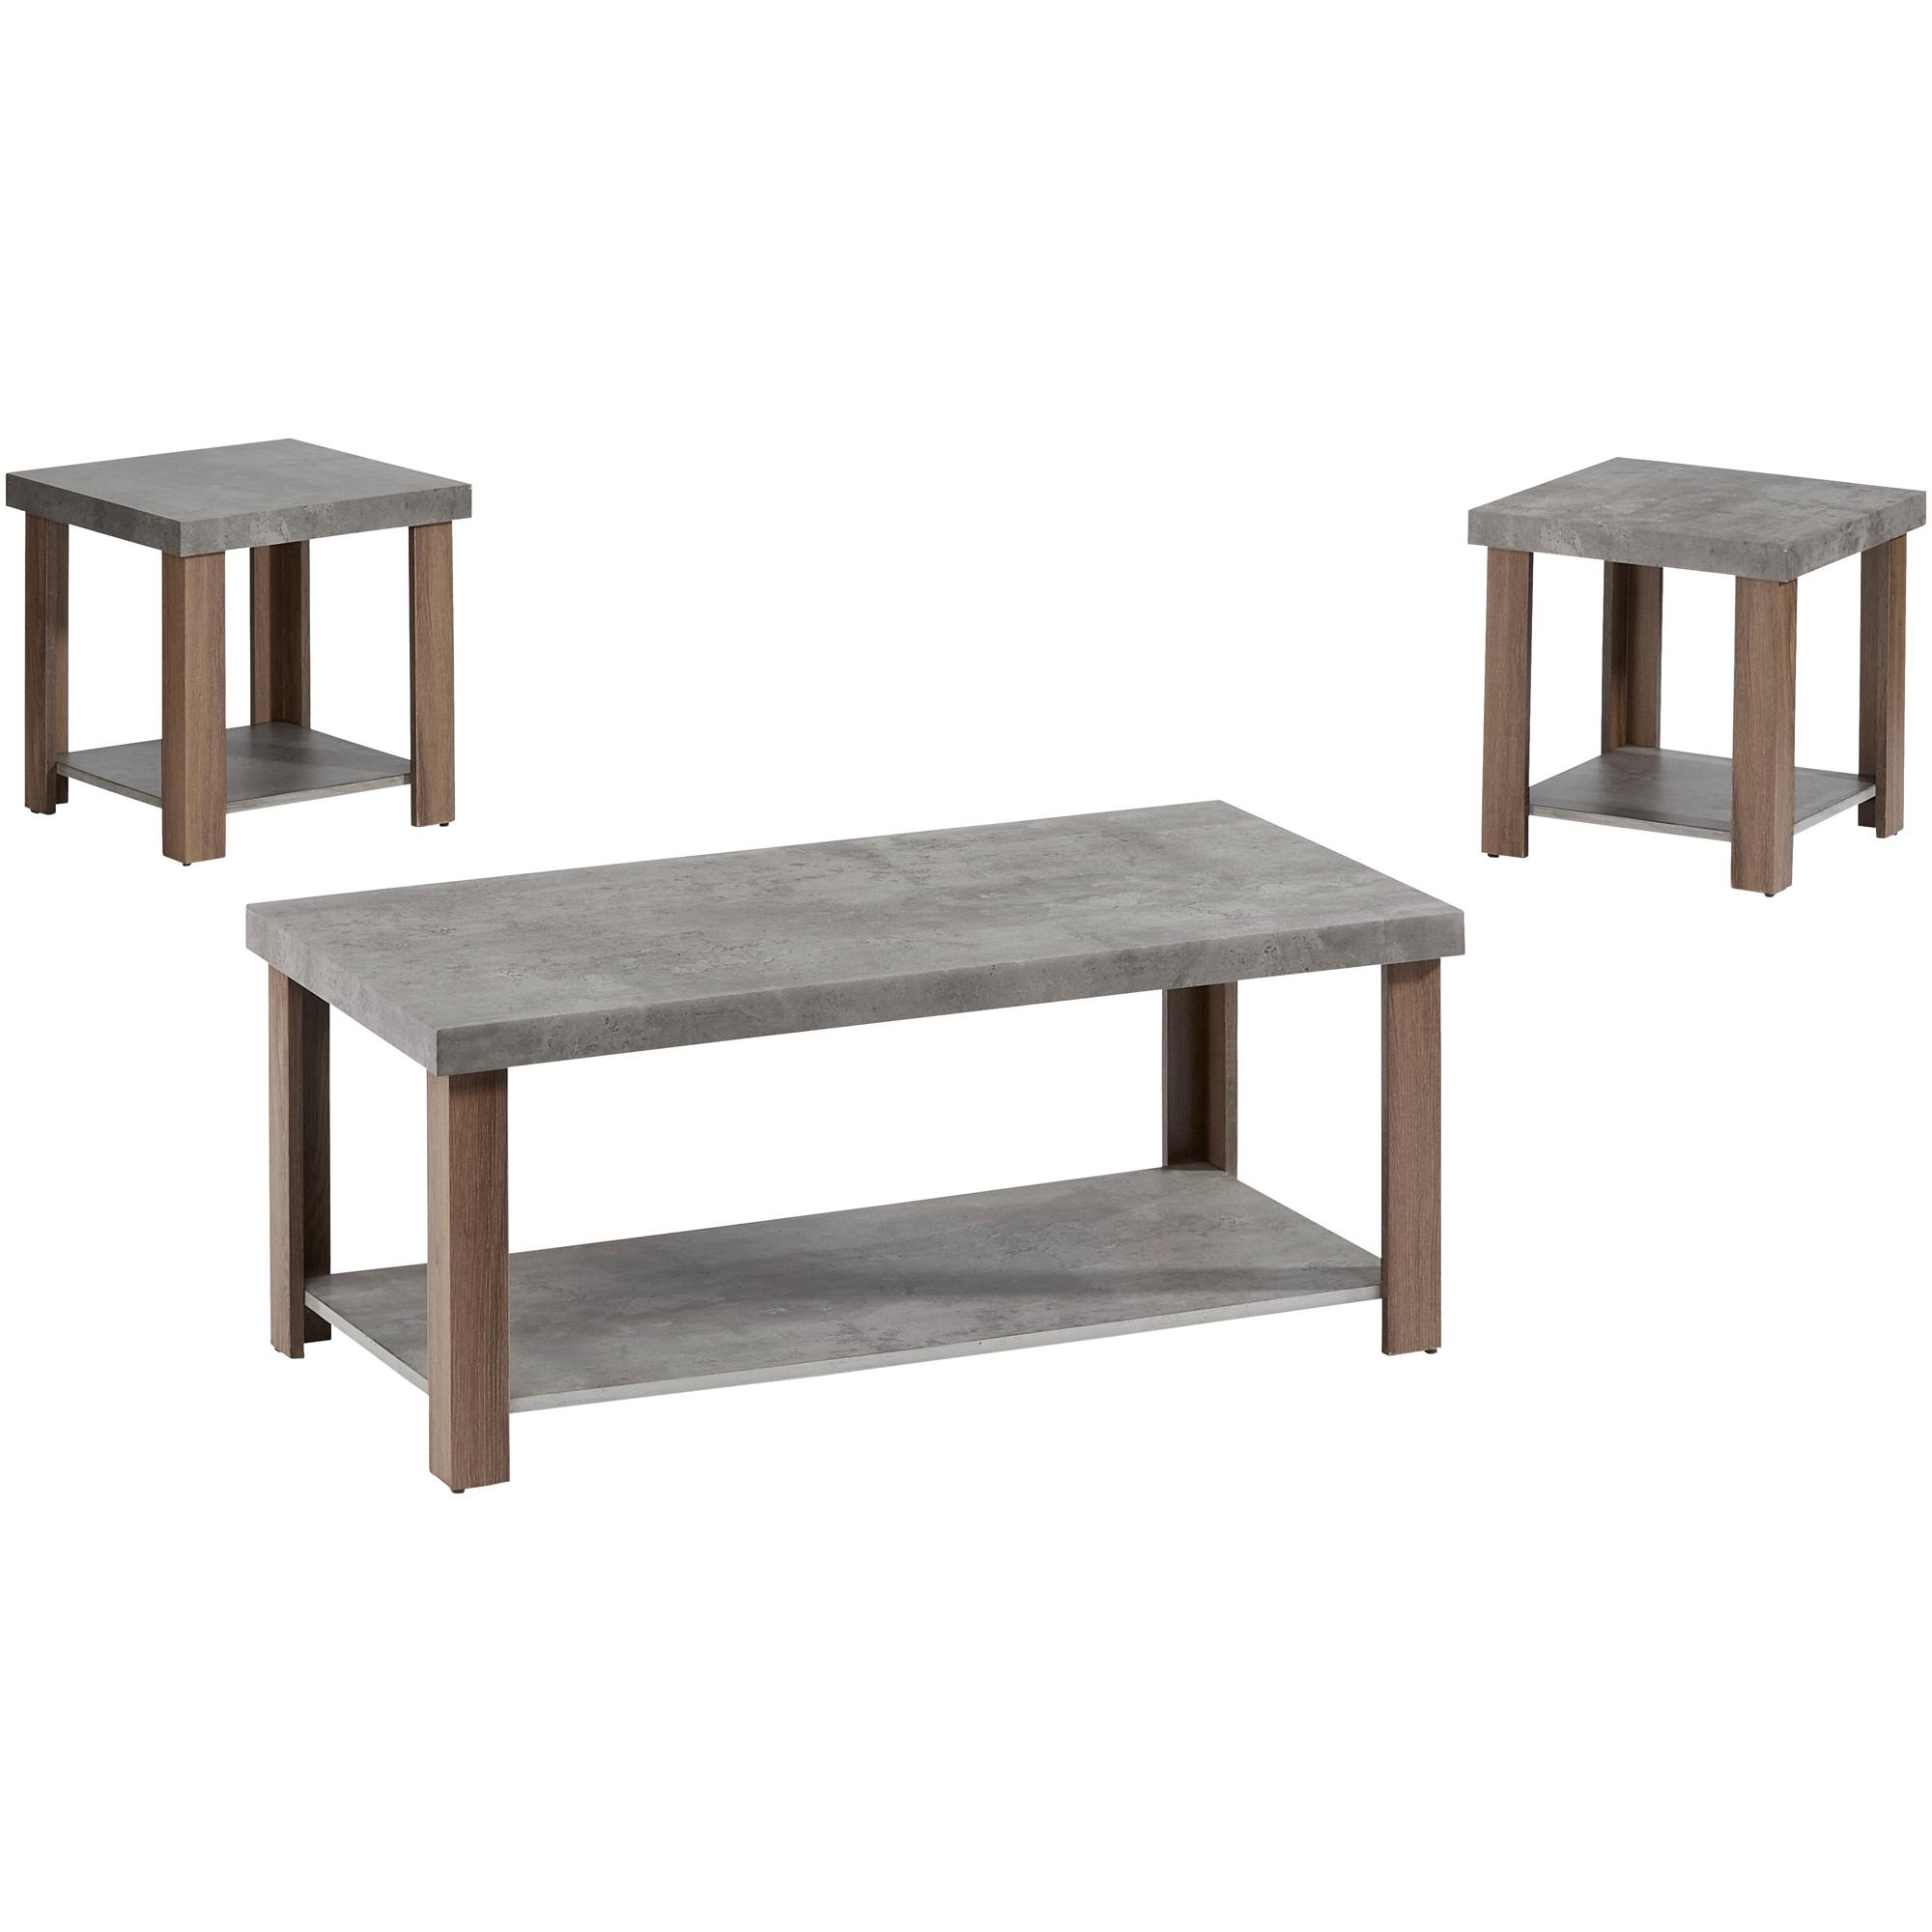 Progressive | Driver Gray 3 Pack Tables